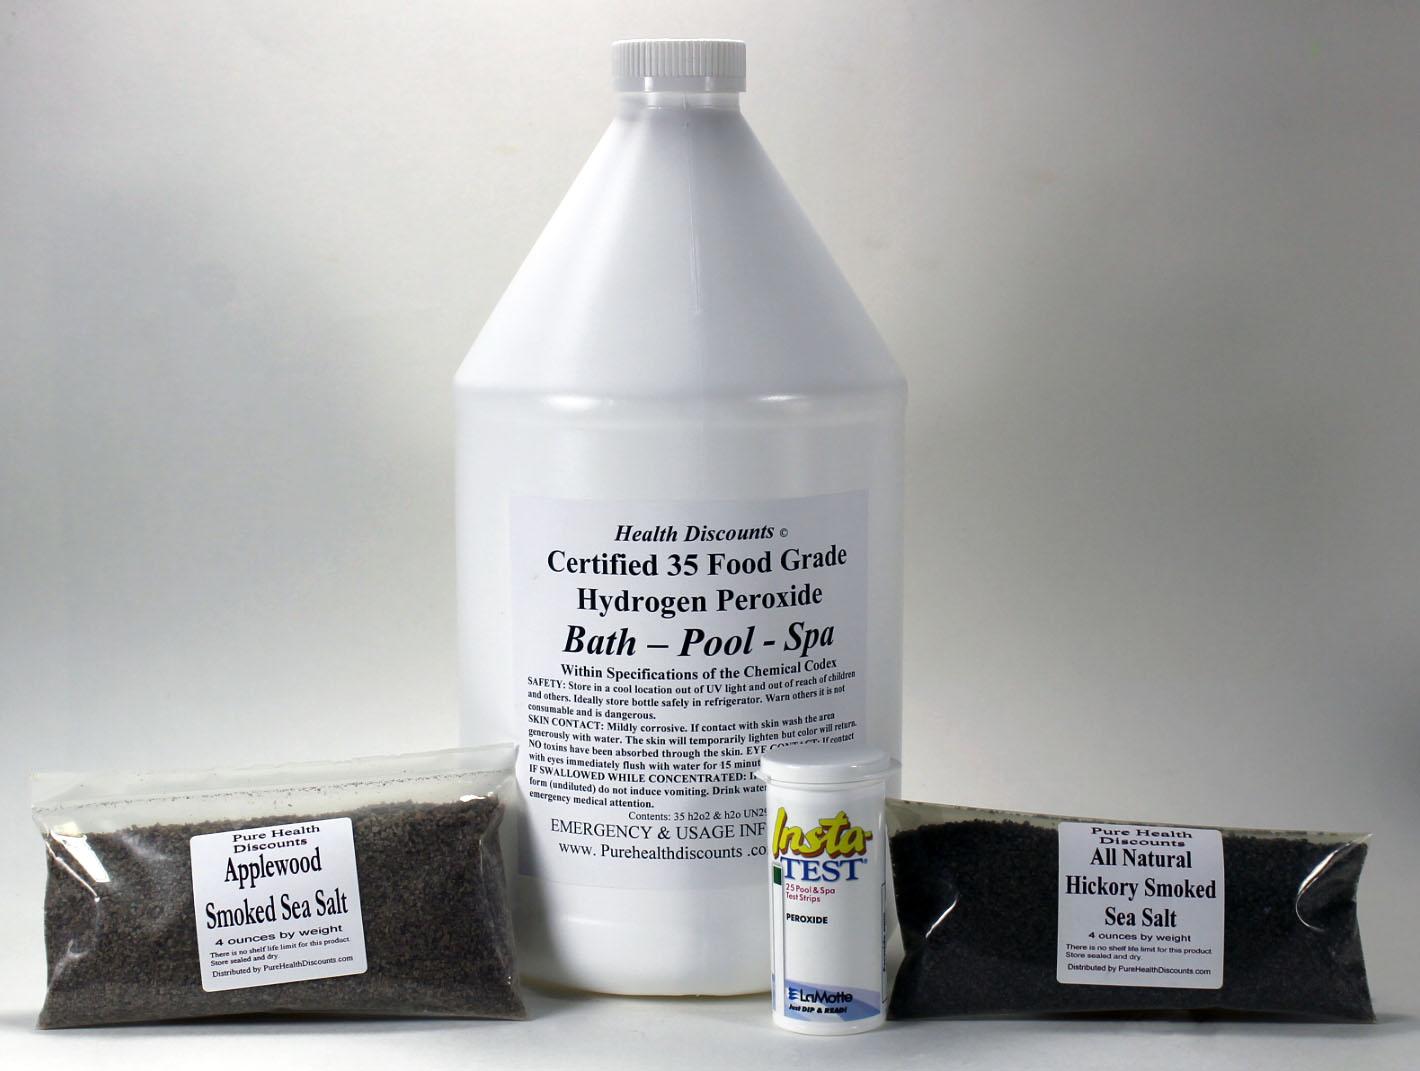 Pure Health Discounts 35 Food Grade Hydrogen Peroxide